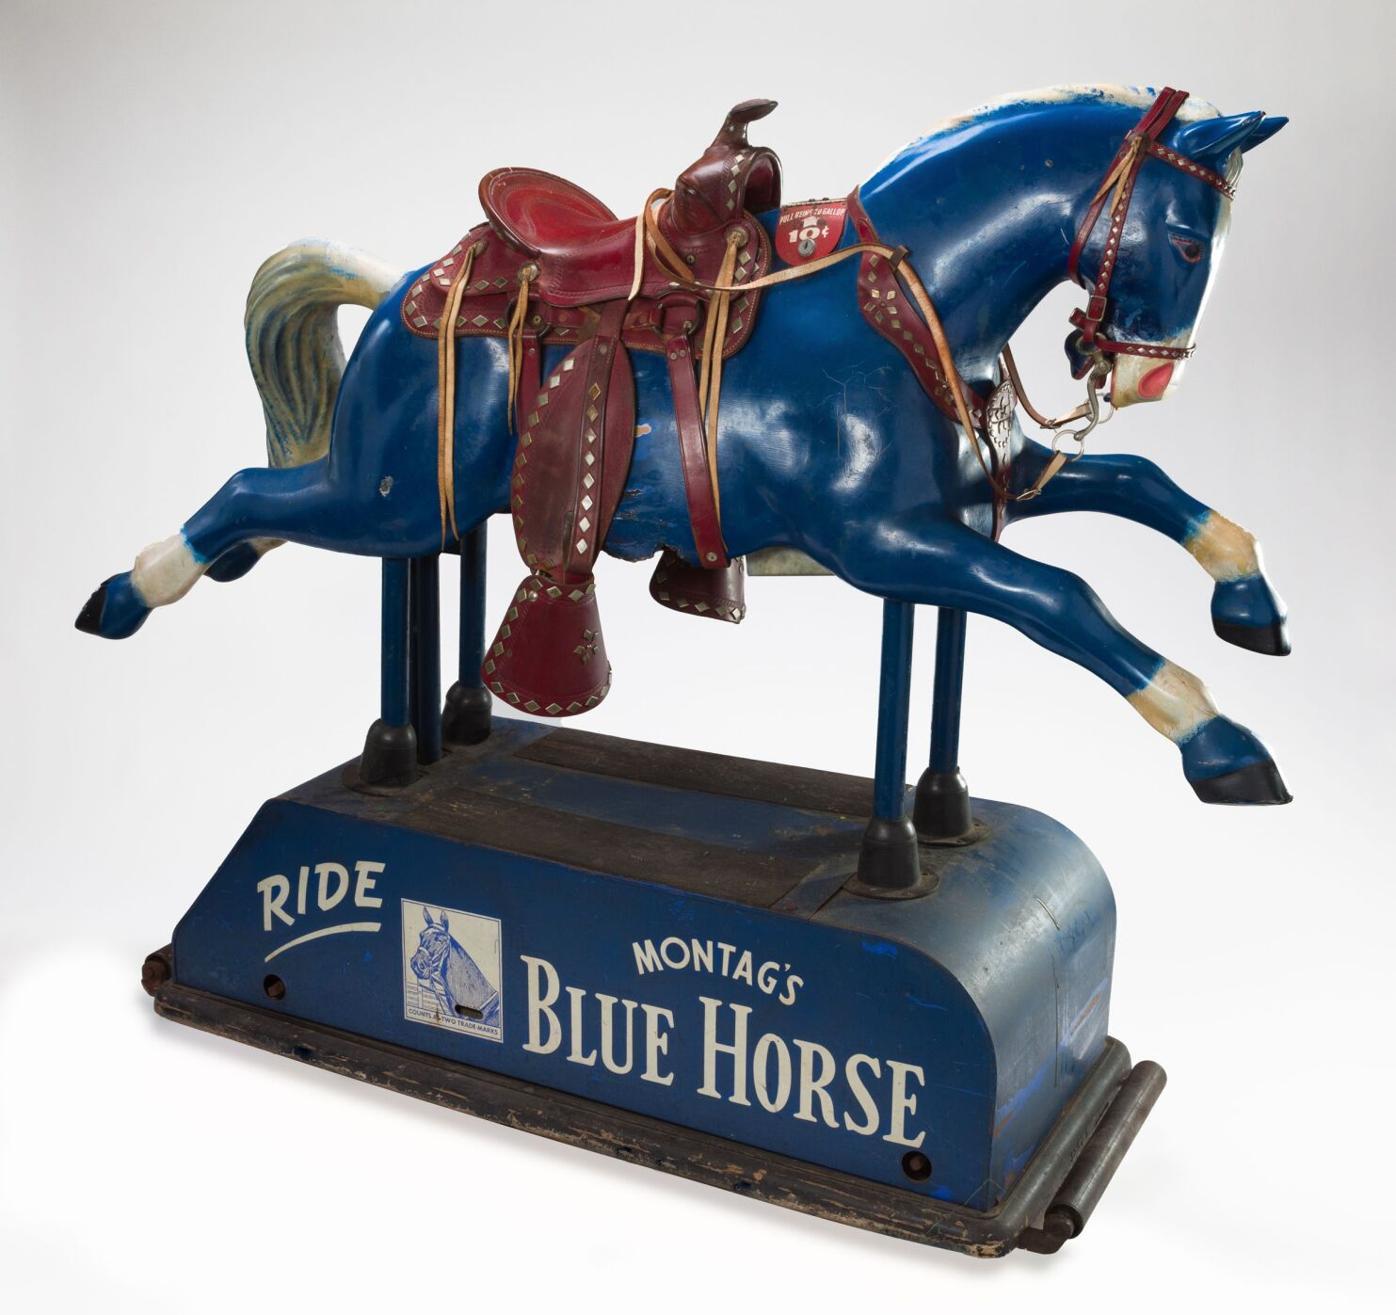 072821_MNS_Breman_Chutzpah_003 Montag Bros. Co. blue horse